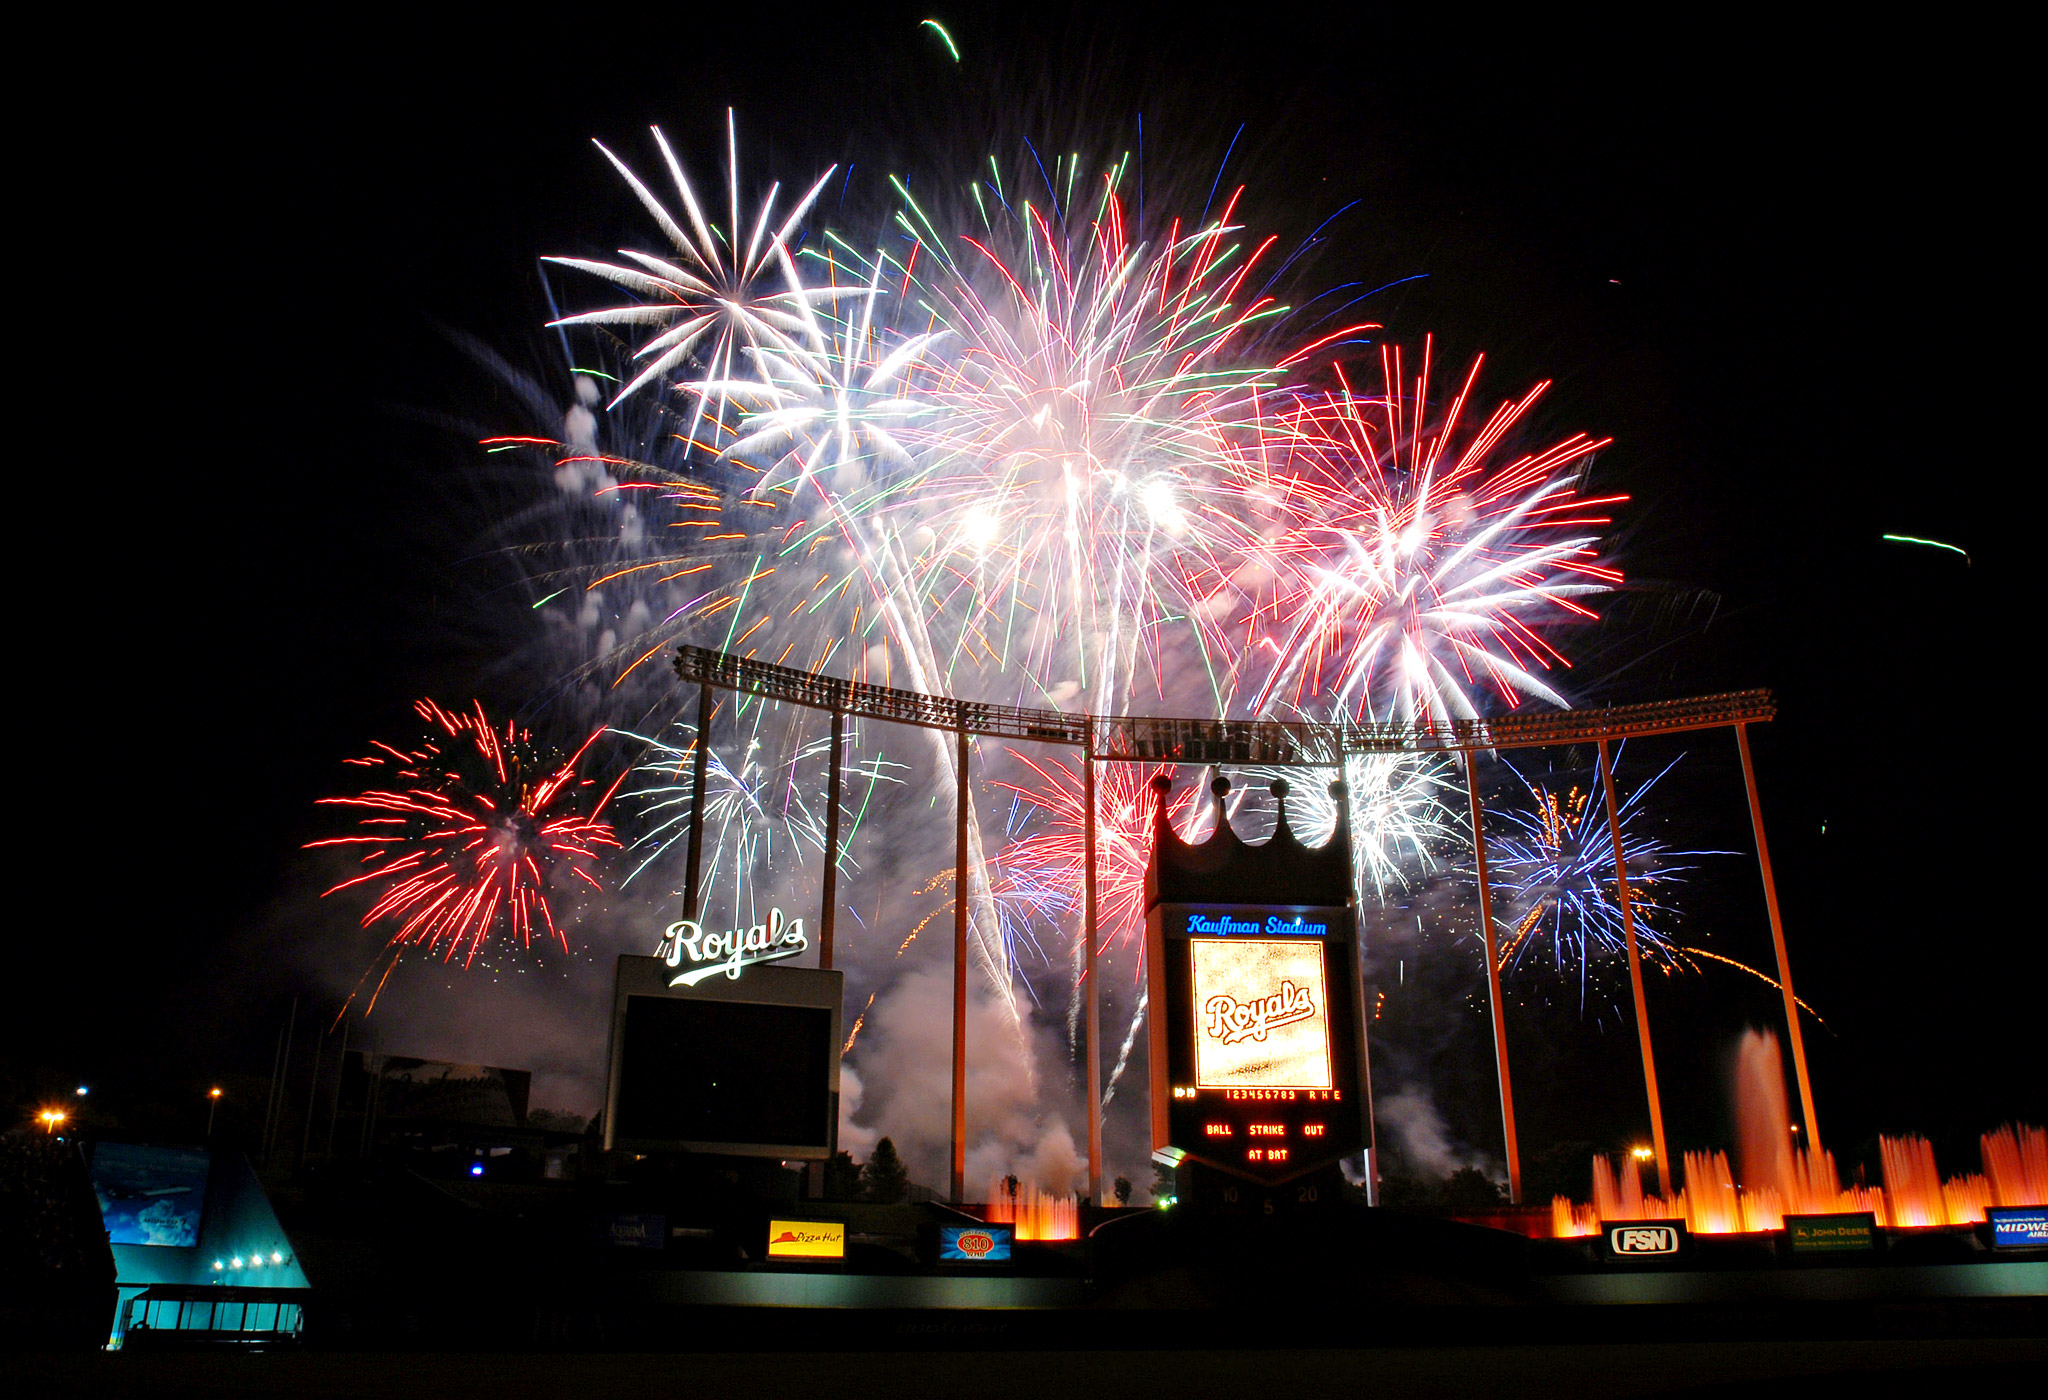 KANSAS CITY ROYALS mlb baseball 24 wallpaper background 2048x1400